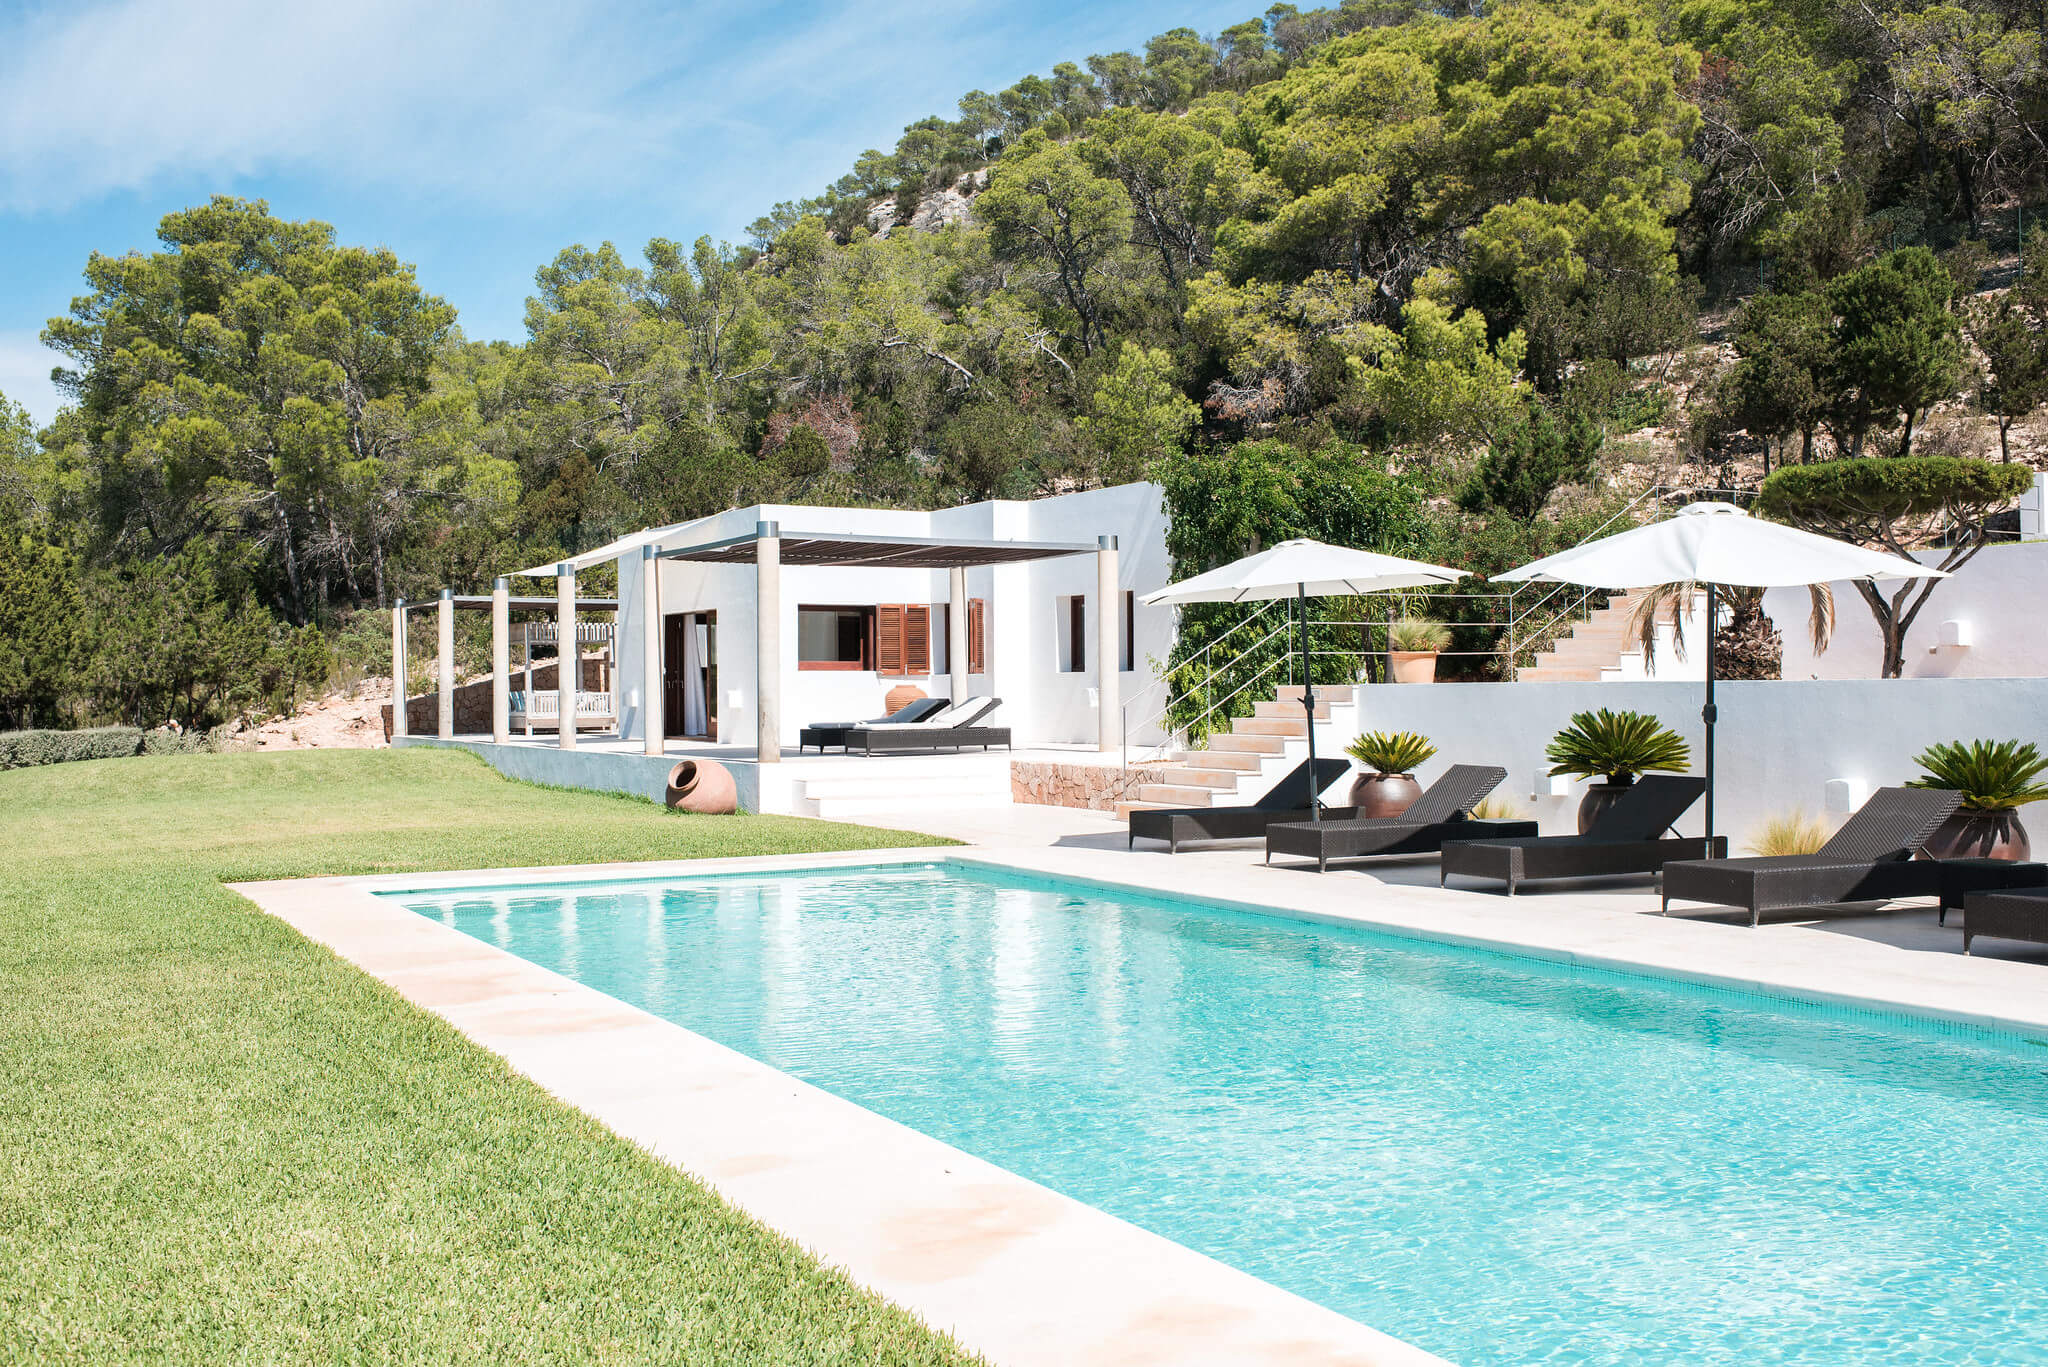 https://www.white-ibiza.com/wp-content/uploads/2020/05/white-ibiza-villas-can-ava-exterior1.jpg